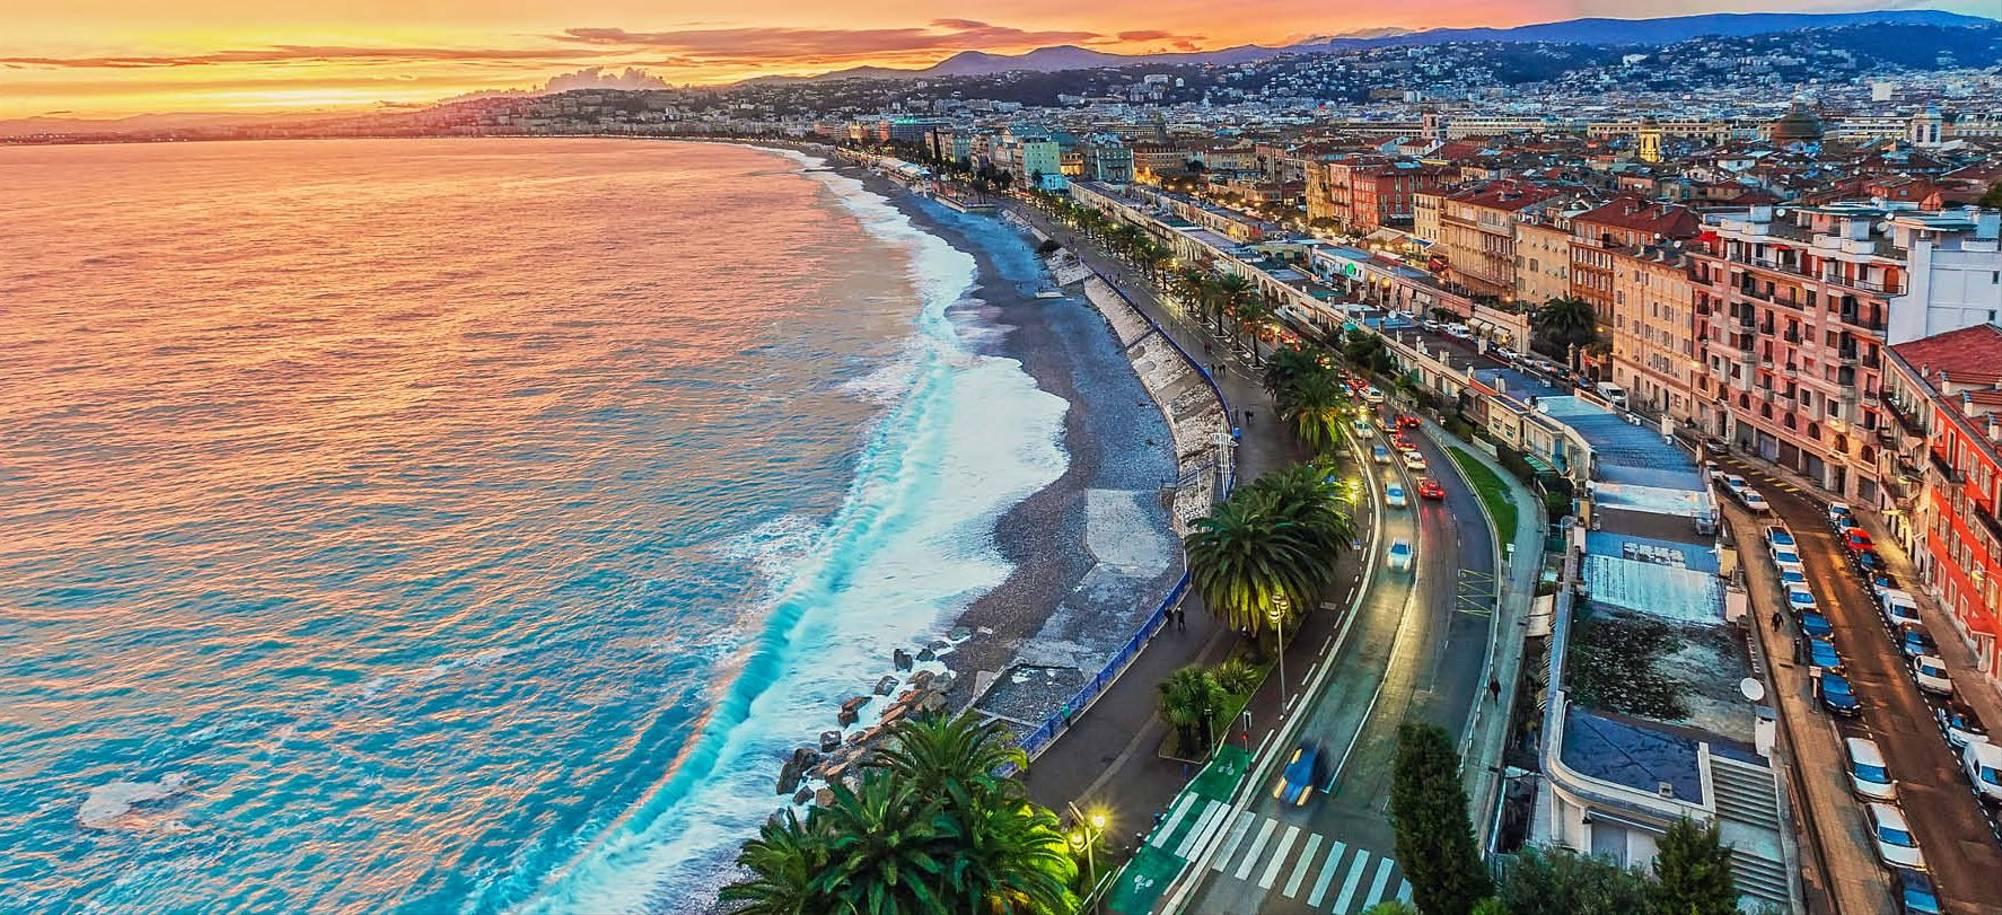 1 - Nice, France.jpg